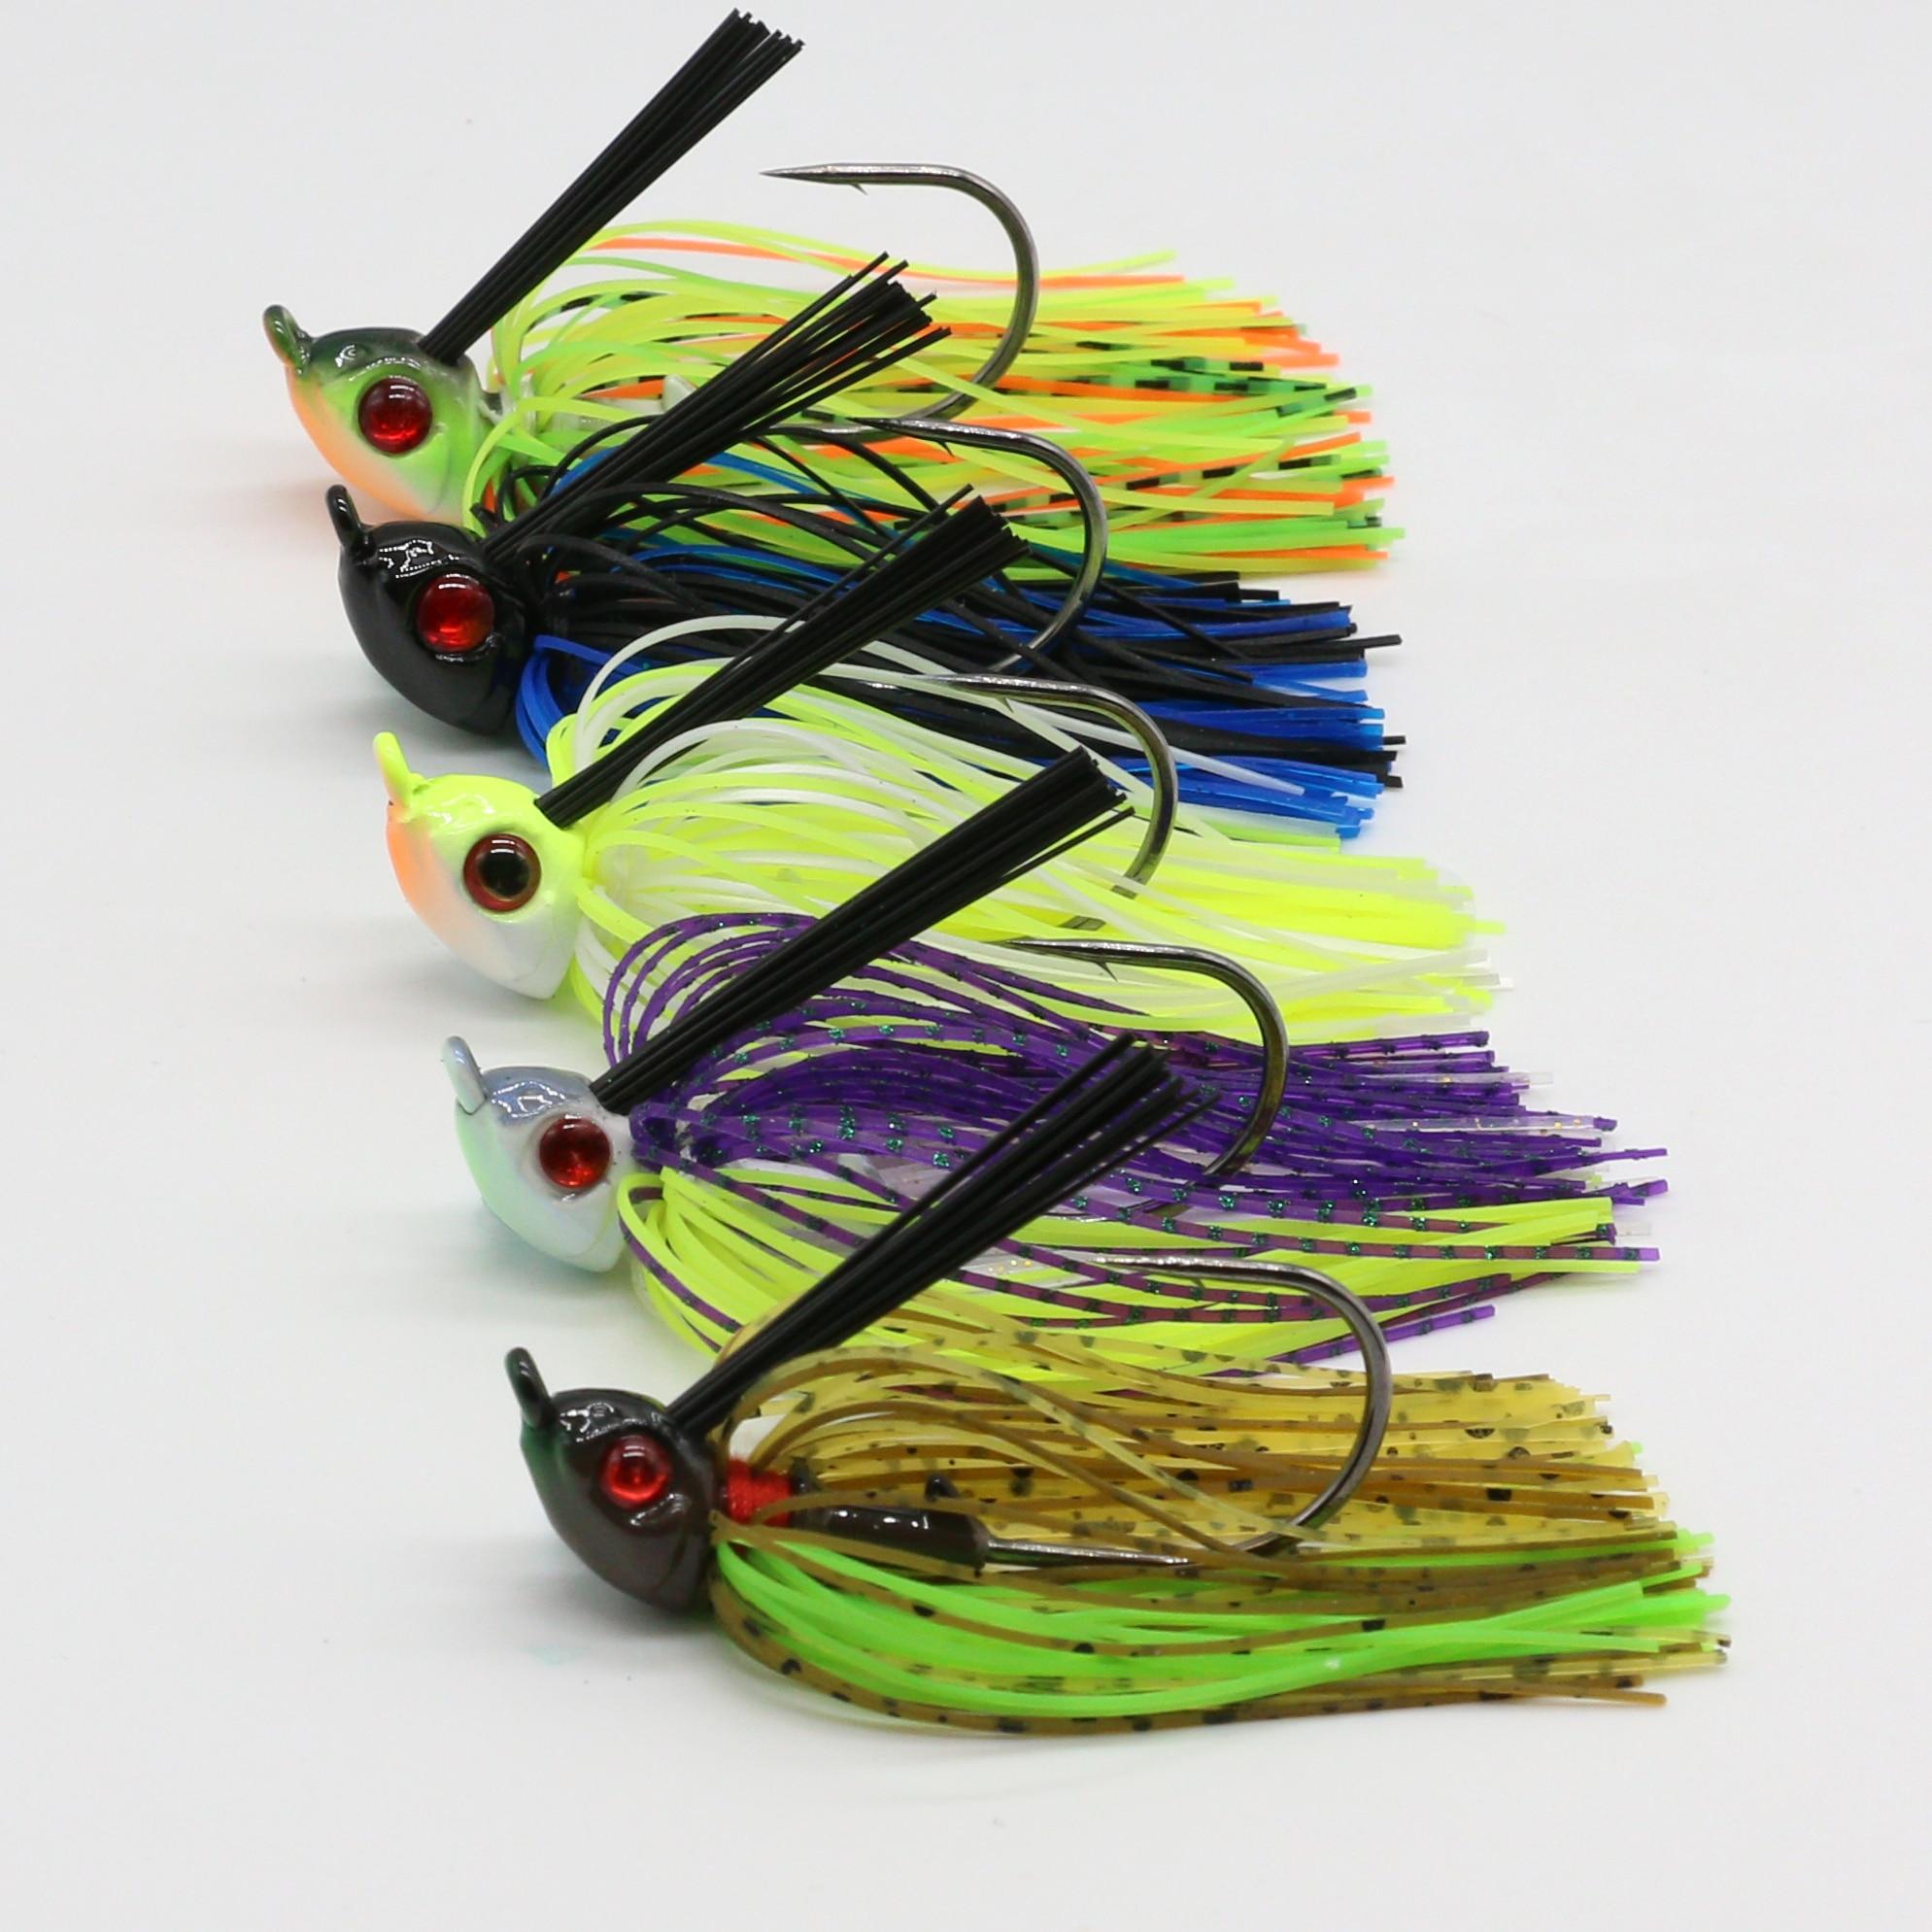 JonStar 1pc  12G/16G Finesse Chatter bait spinnerbait fishing lure wobbler chatterbait for bass pike walleye fishing-2